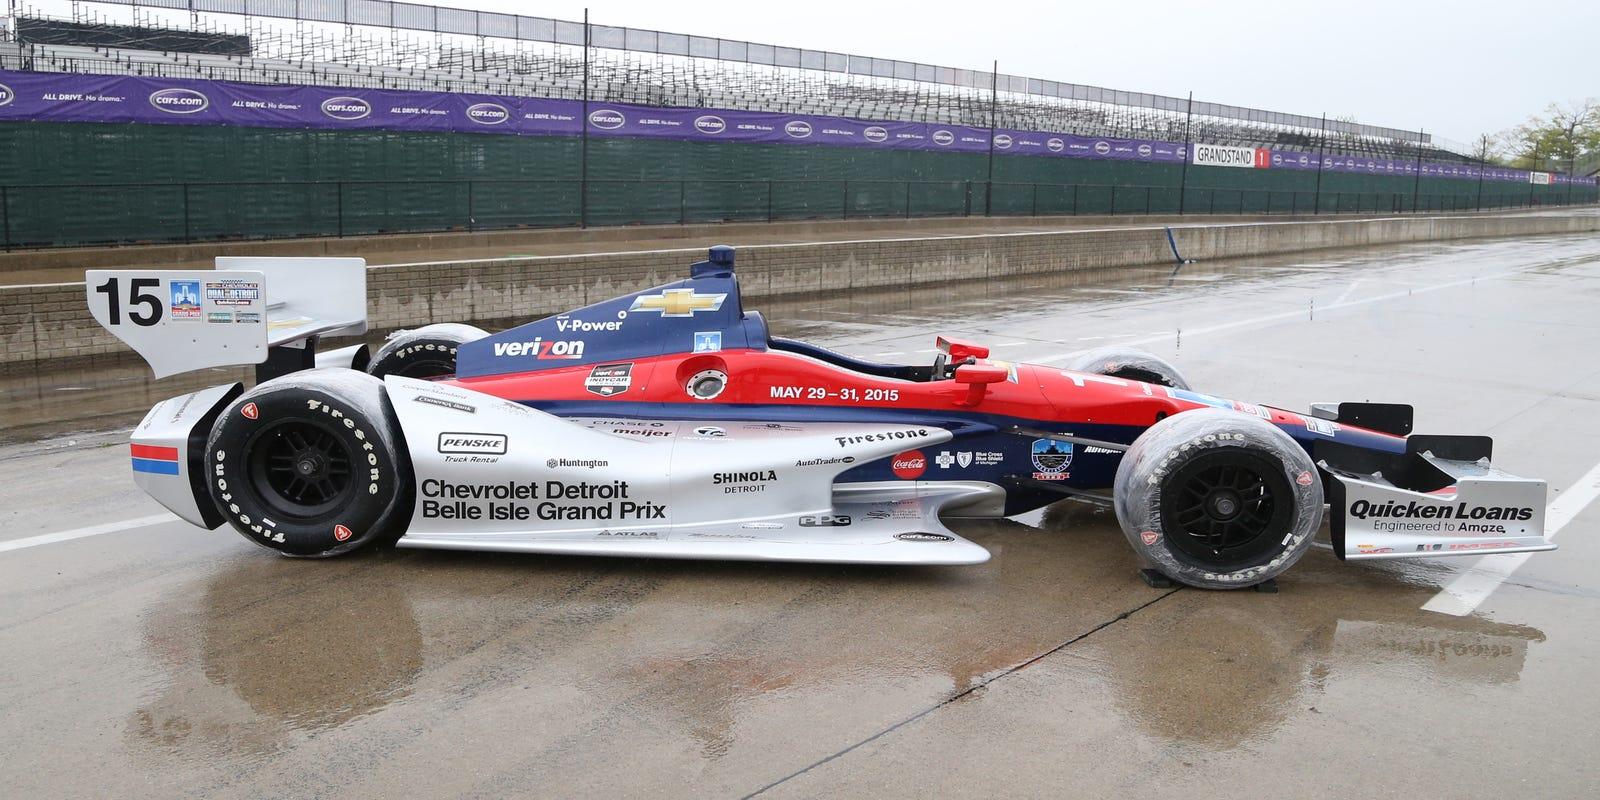 2015 Chevrolet Detroit Belle Isle Grand Prix